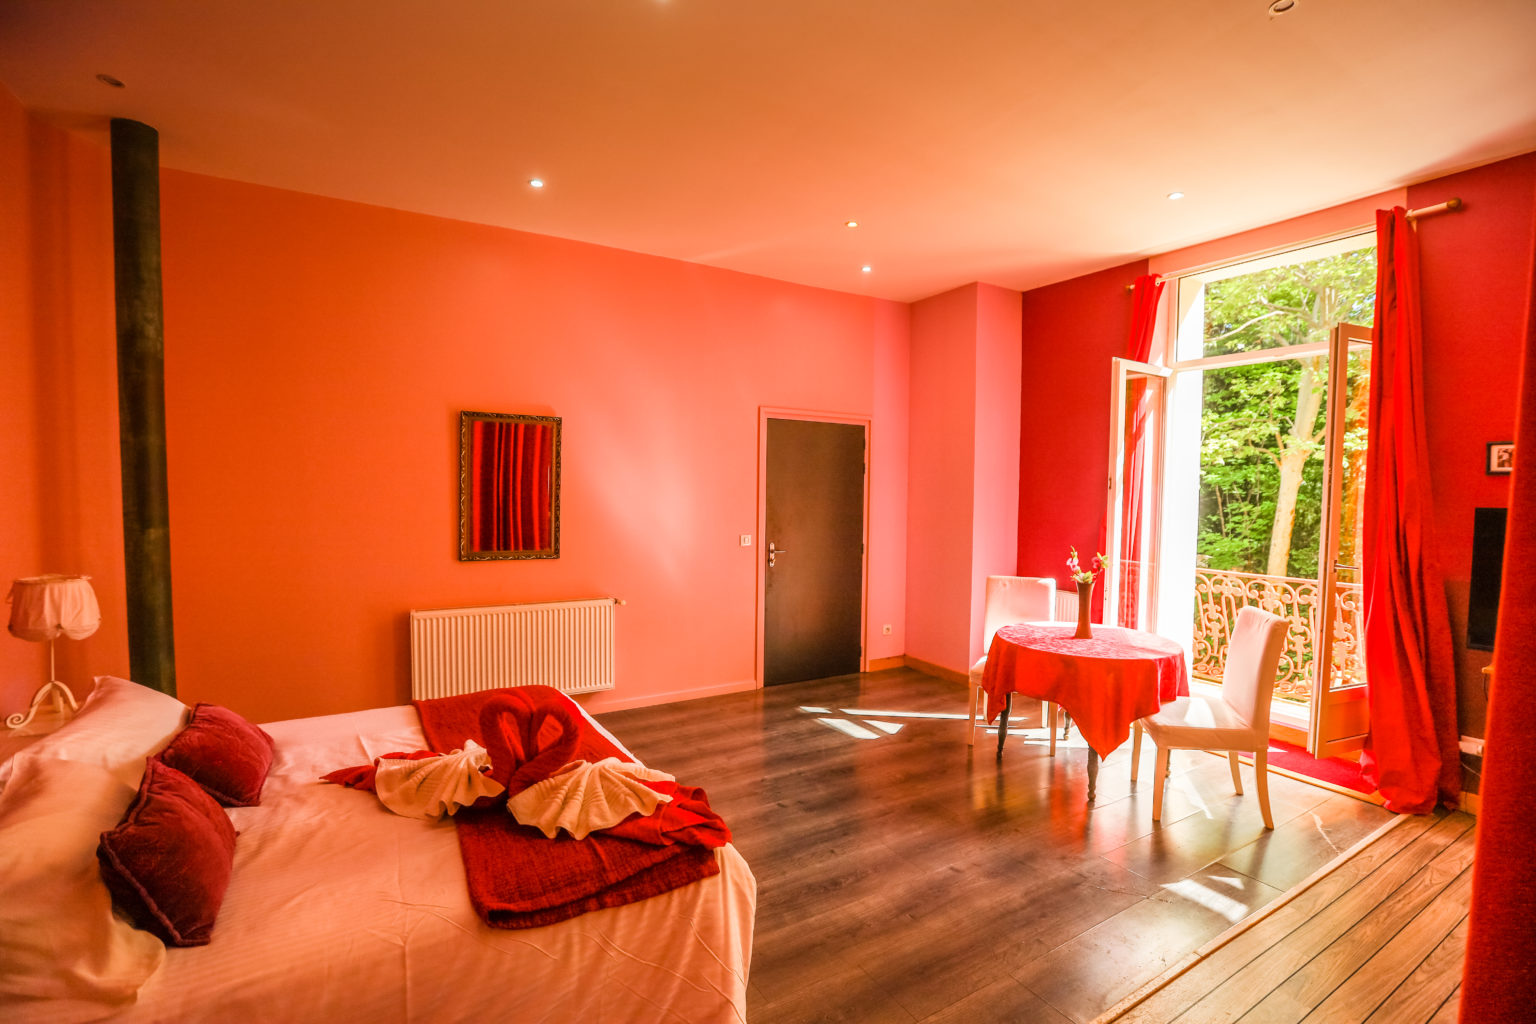 CHAMBRE LA FONTVINEUSE IMG_1640LA FONT VINEUSE HOTEL & SPA